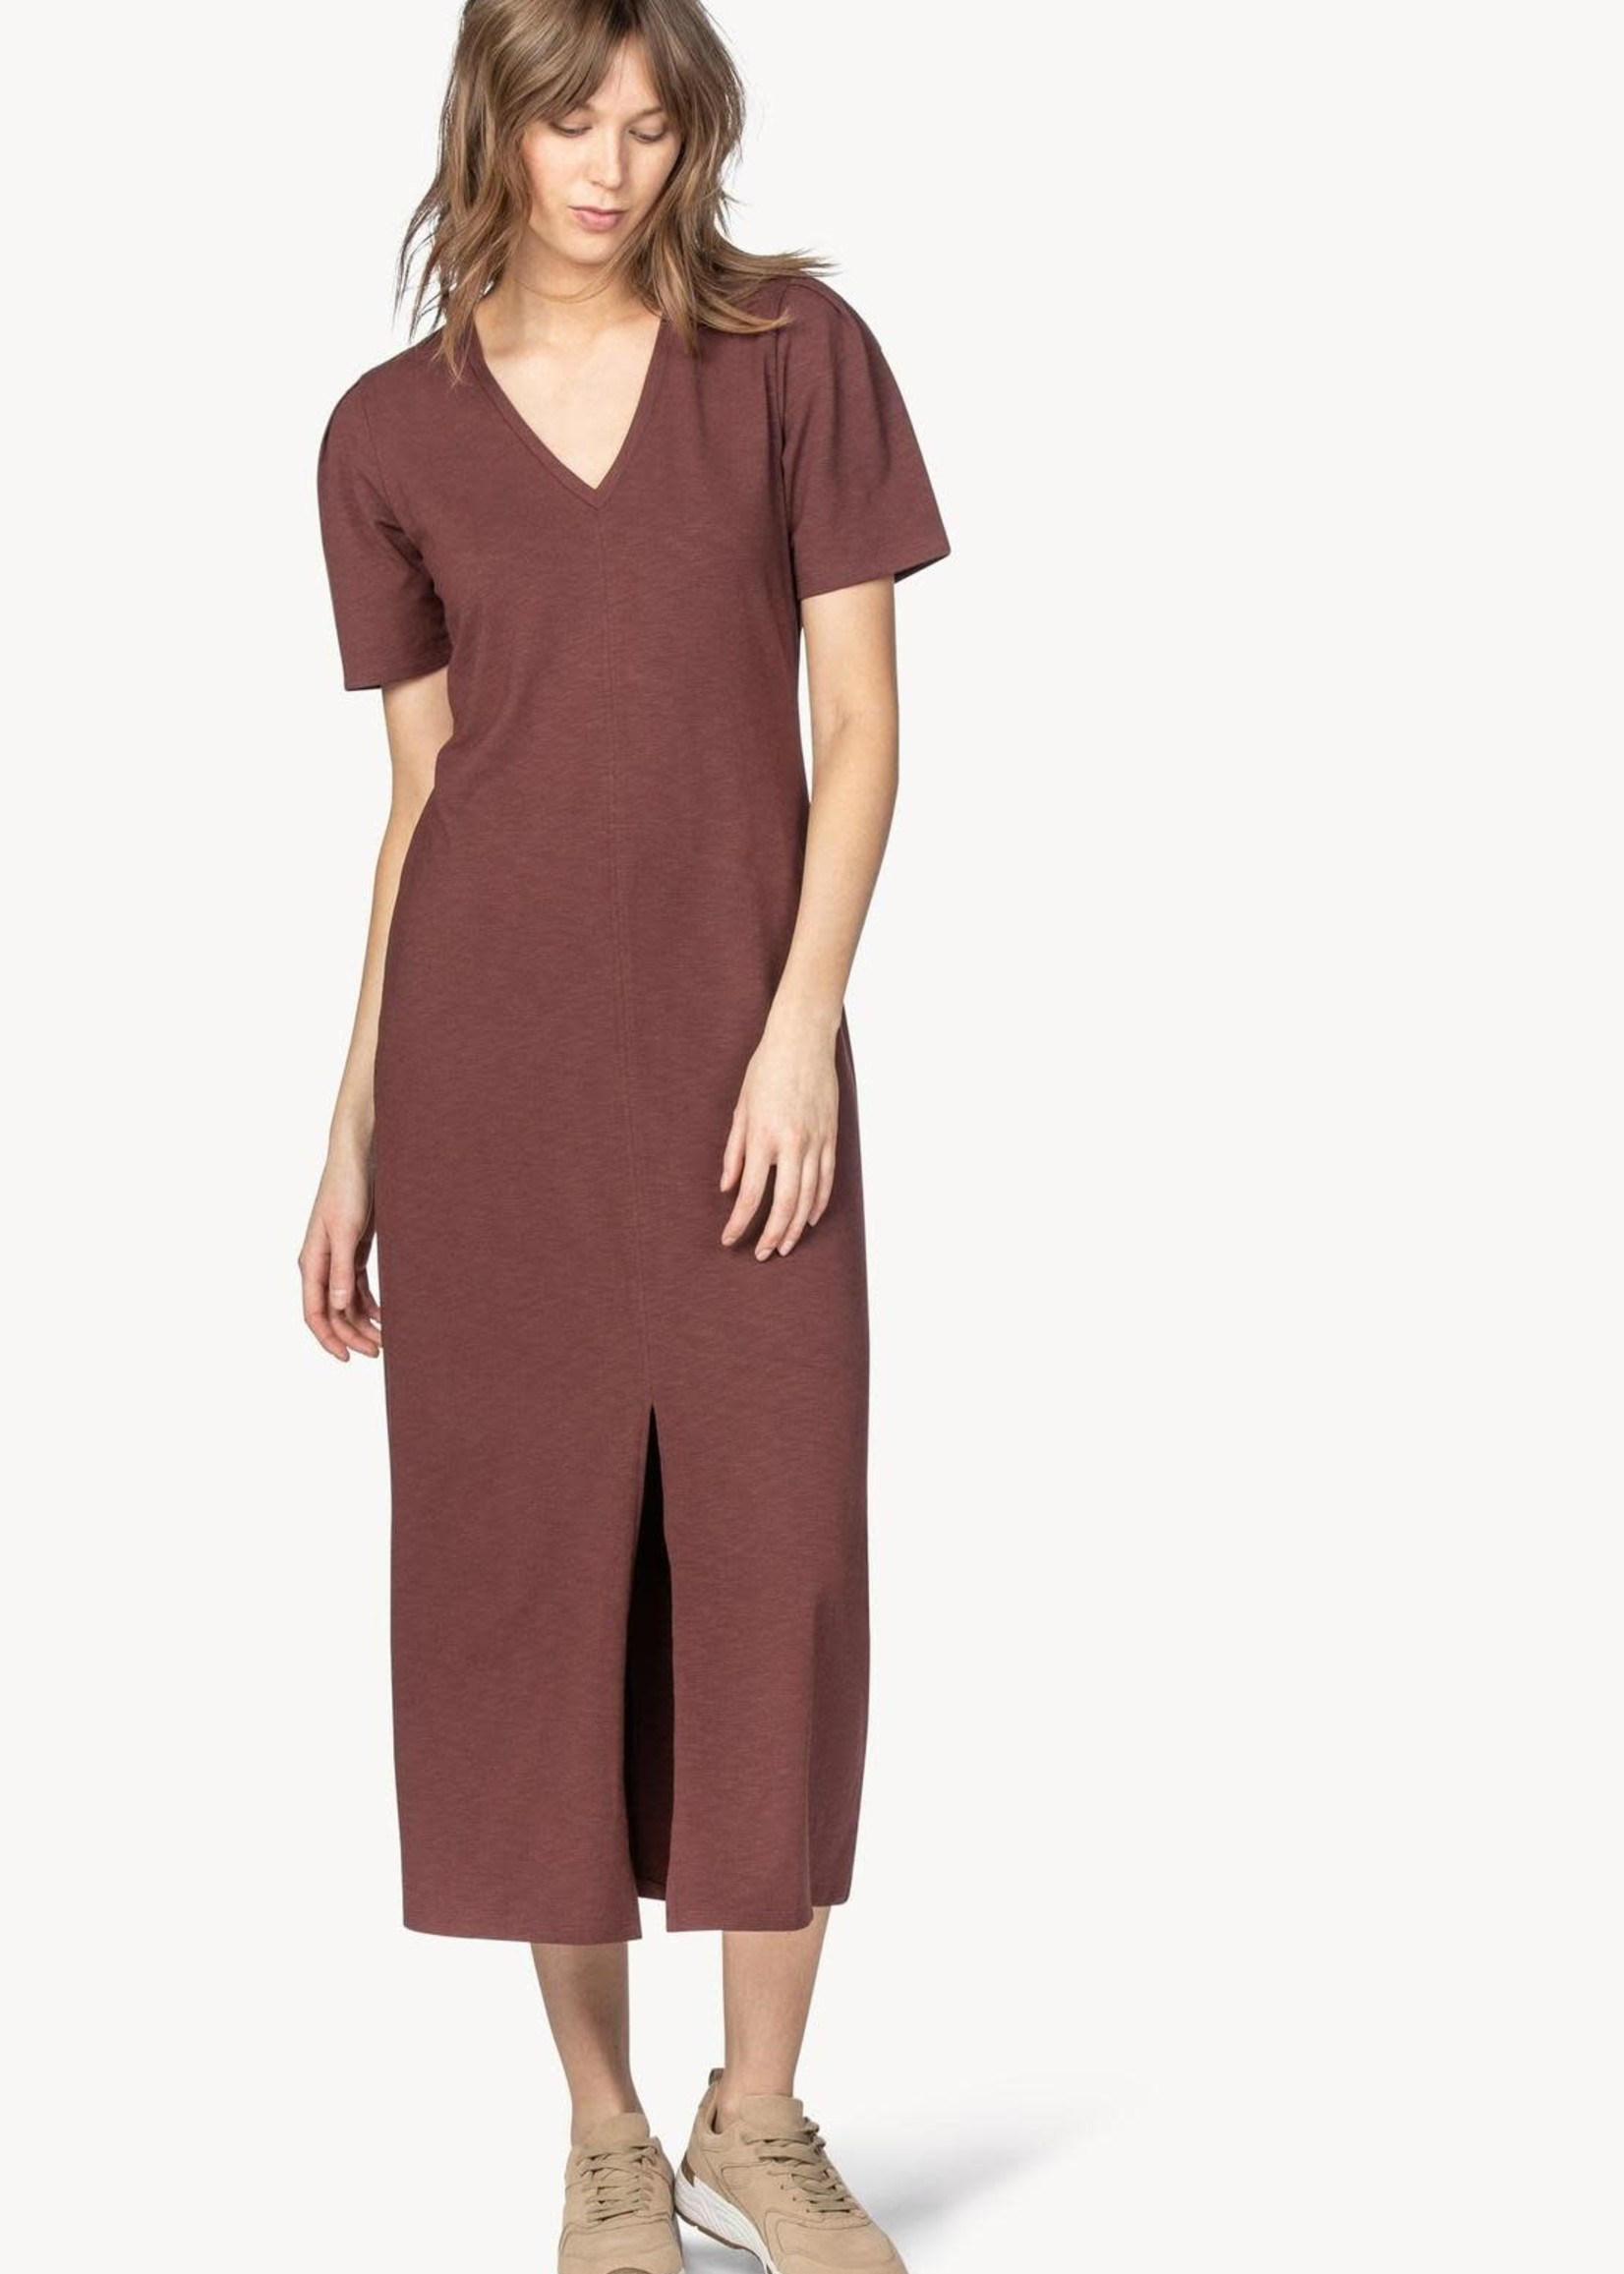 Lilla P Elbow Sleeve V Neck Dress